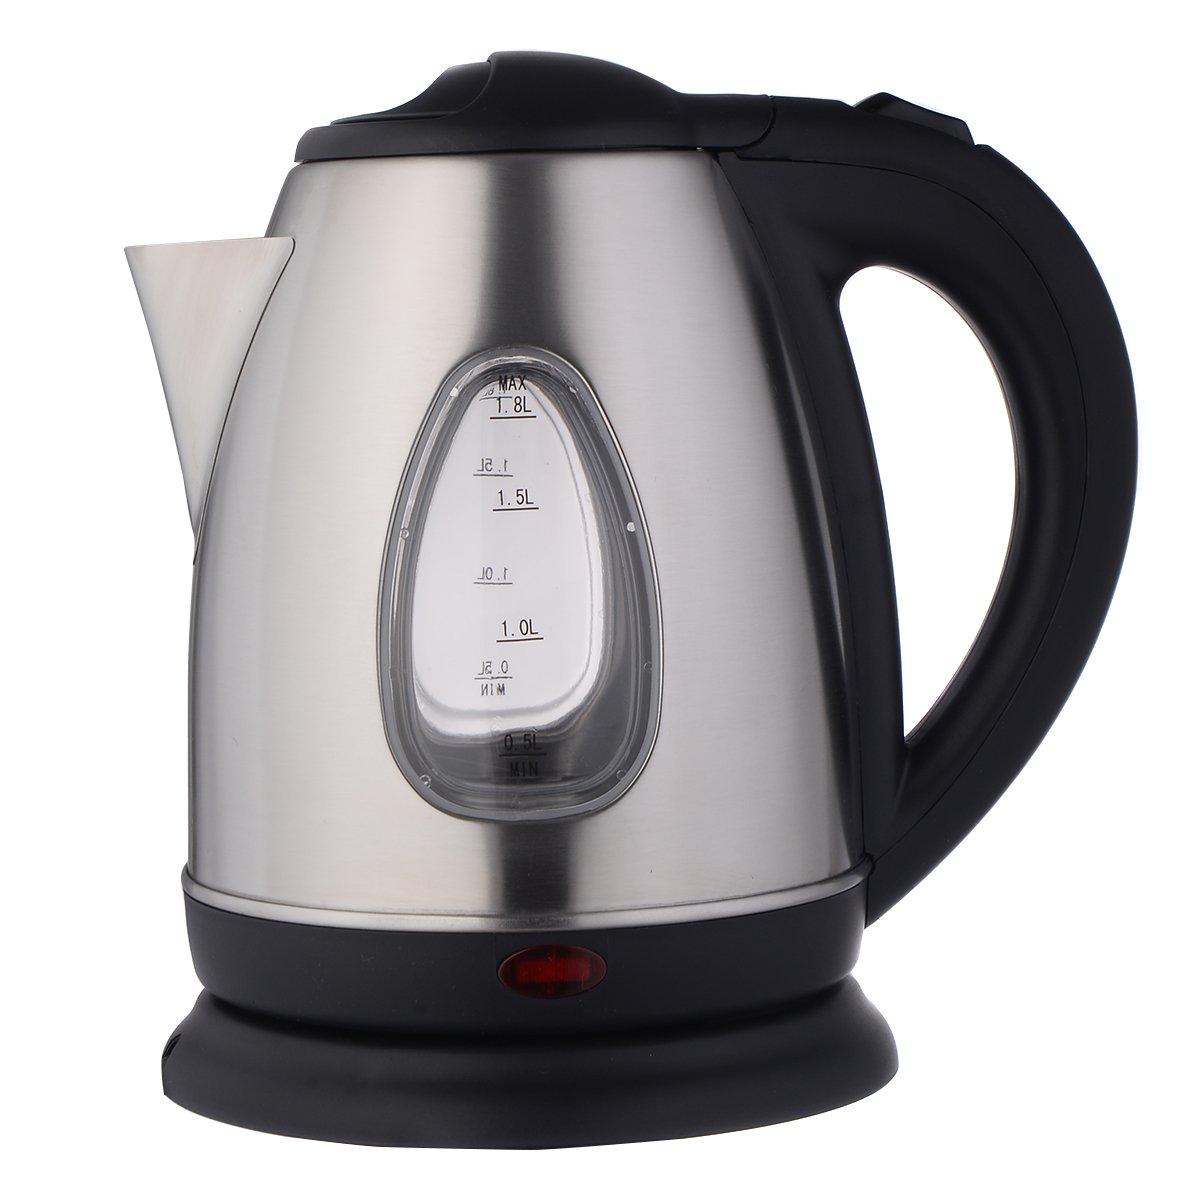 Amazon.com: Giantex 1500W 1.8 Liter Electric Kettle Tea Hot Water ...